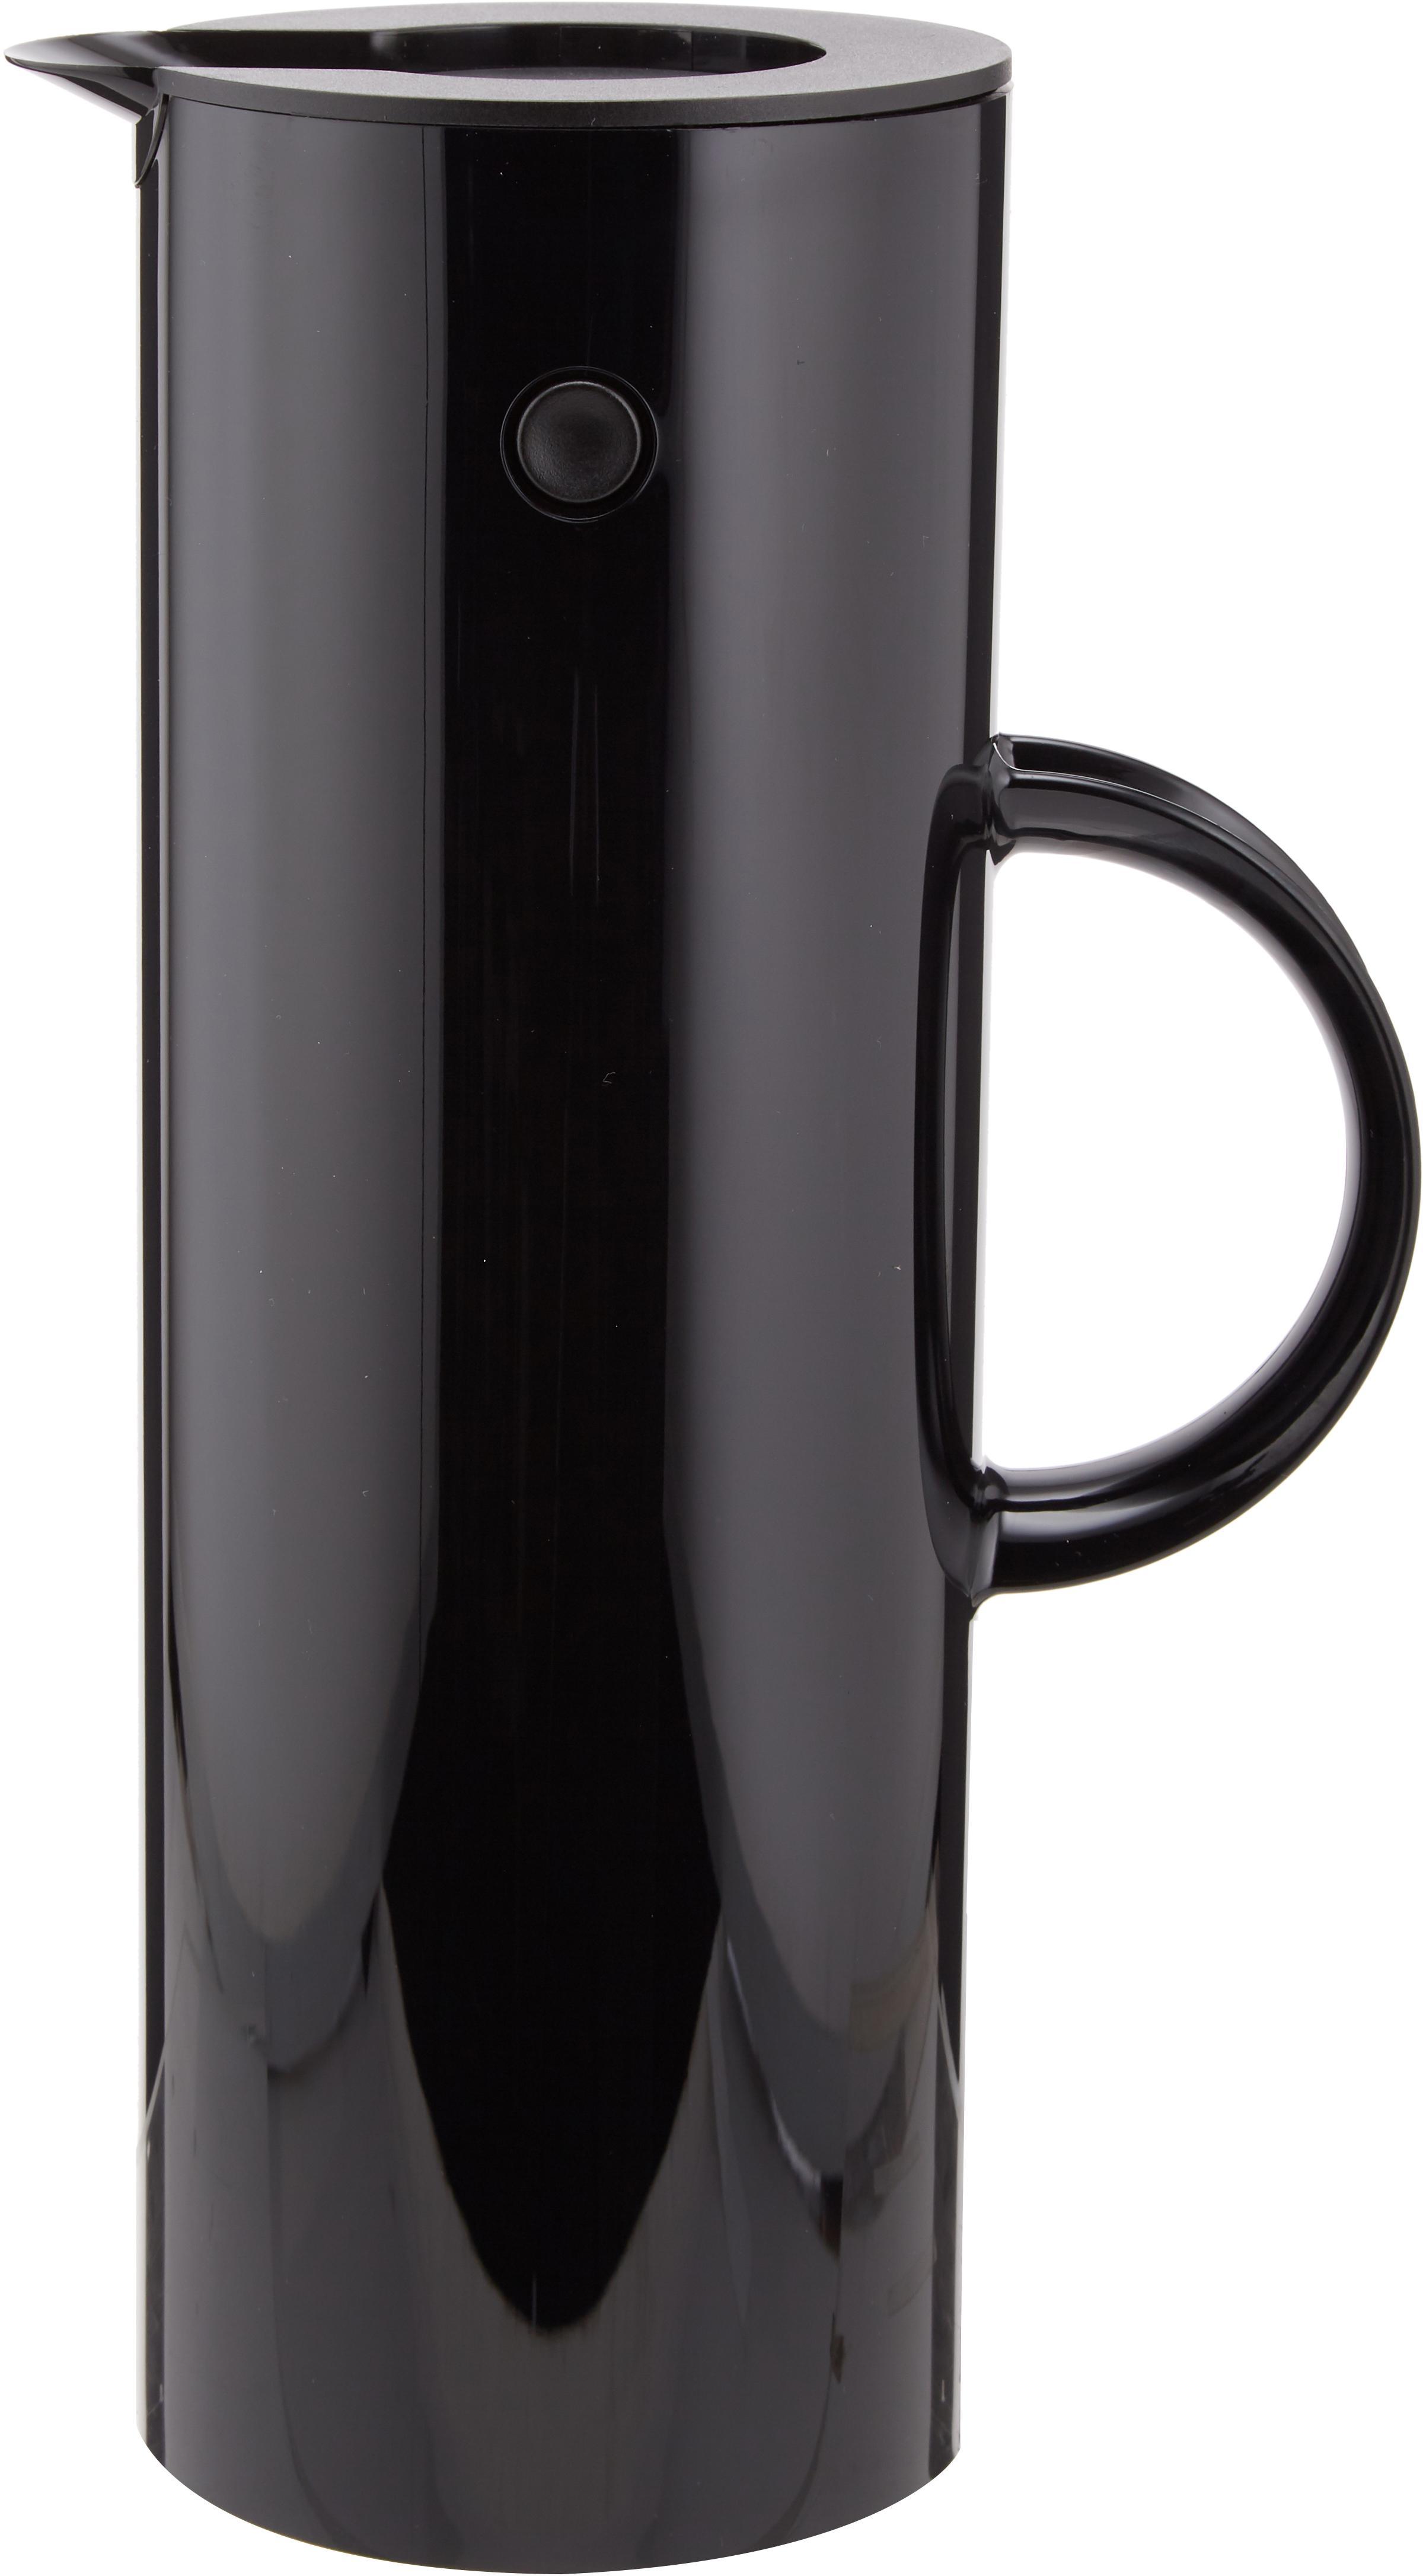 Termo EM77, Plástico ABS, interior con inserto de vidrio, Negro, 1 L